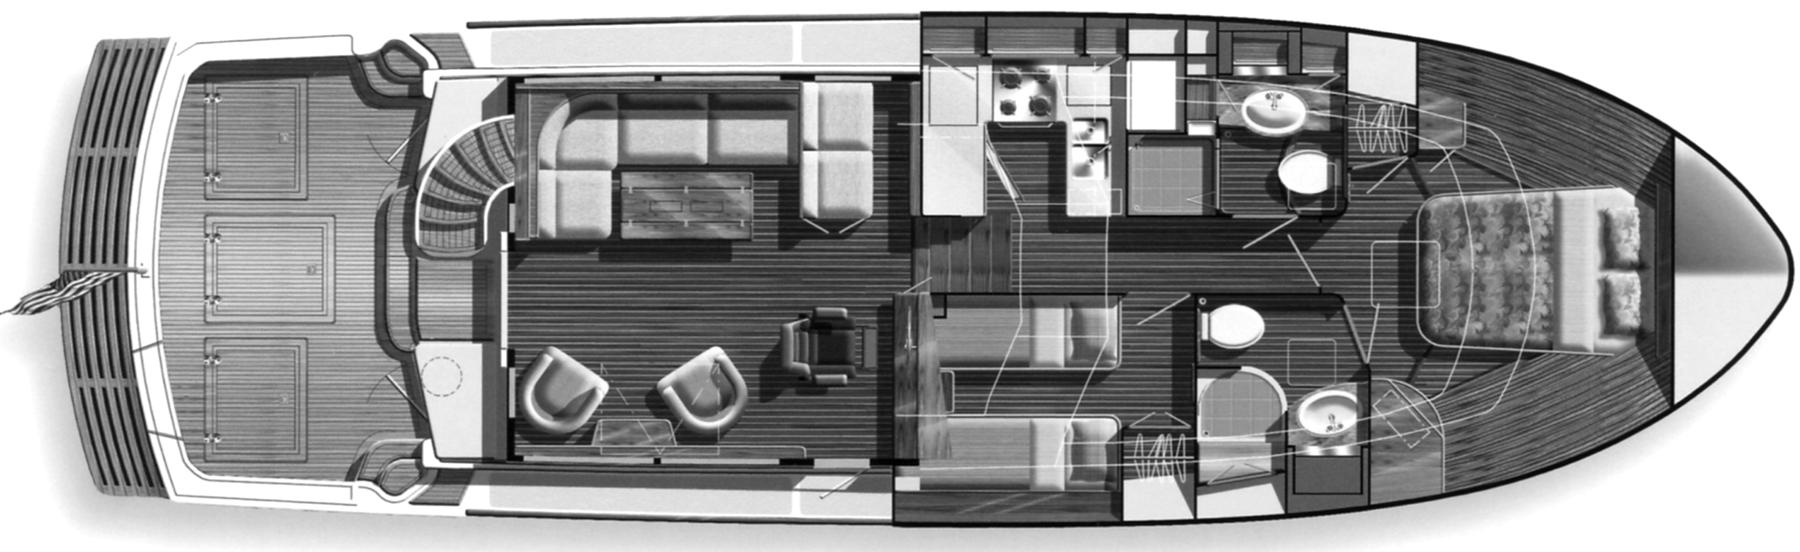 Eastbay 47 Flybridge Floor Plan 2